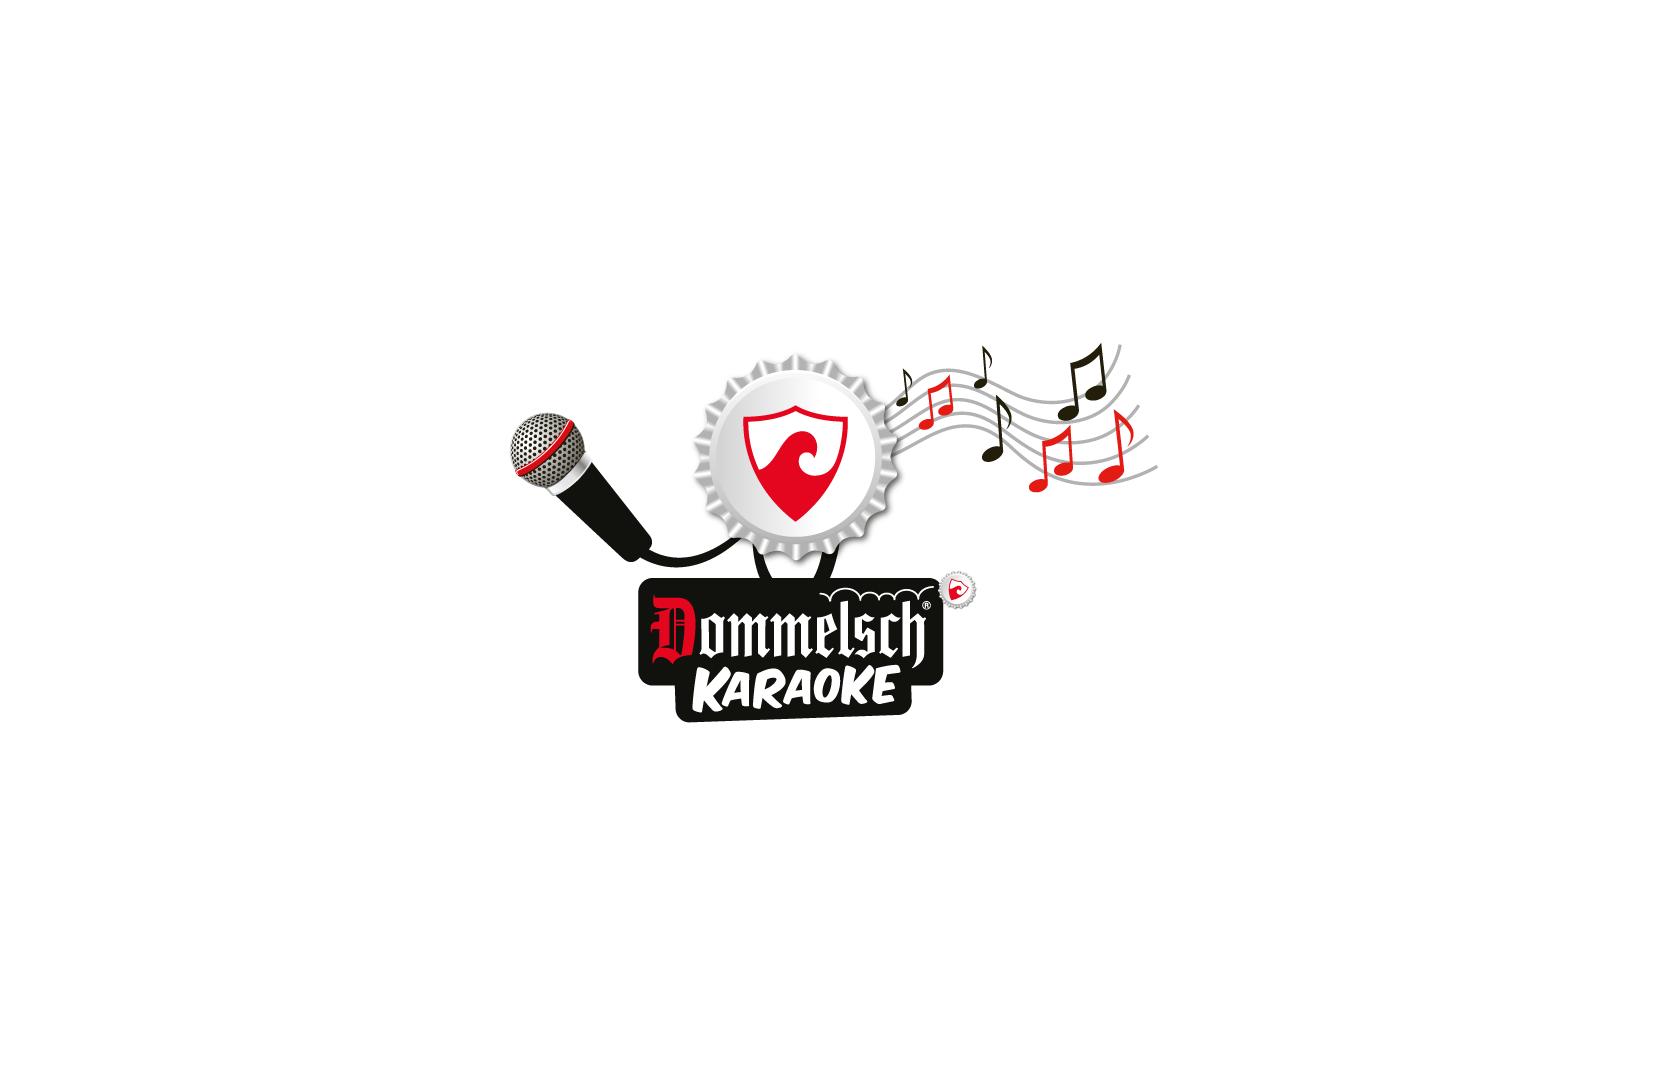 multi_dommelsch_logo3